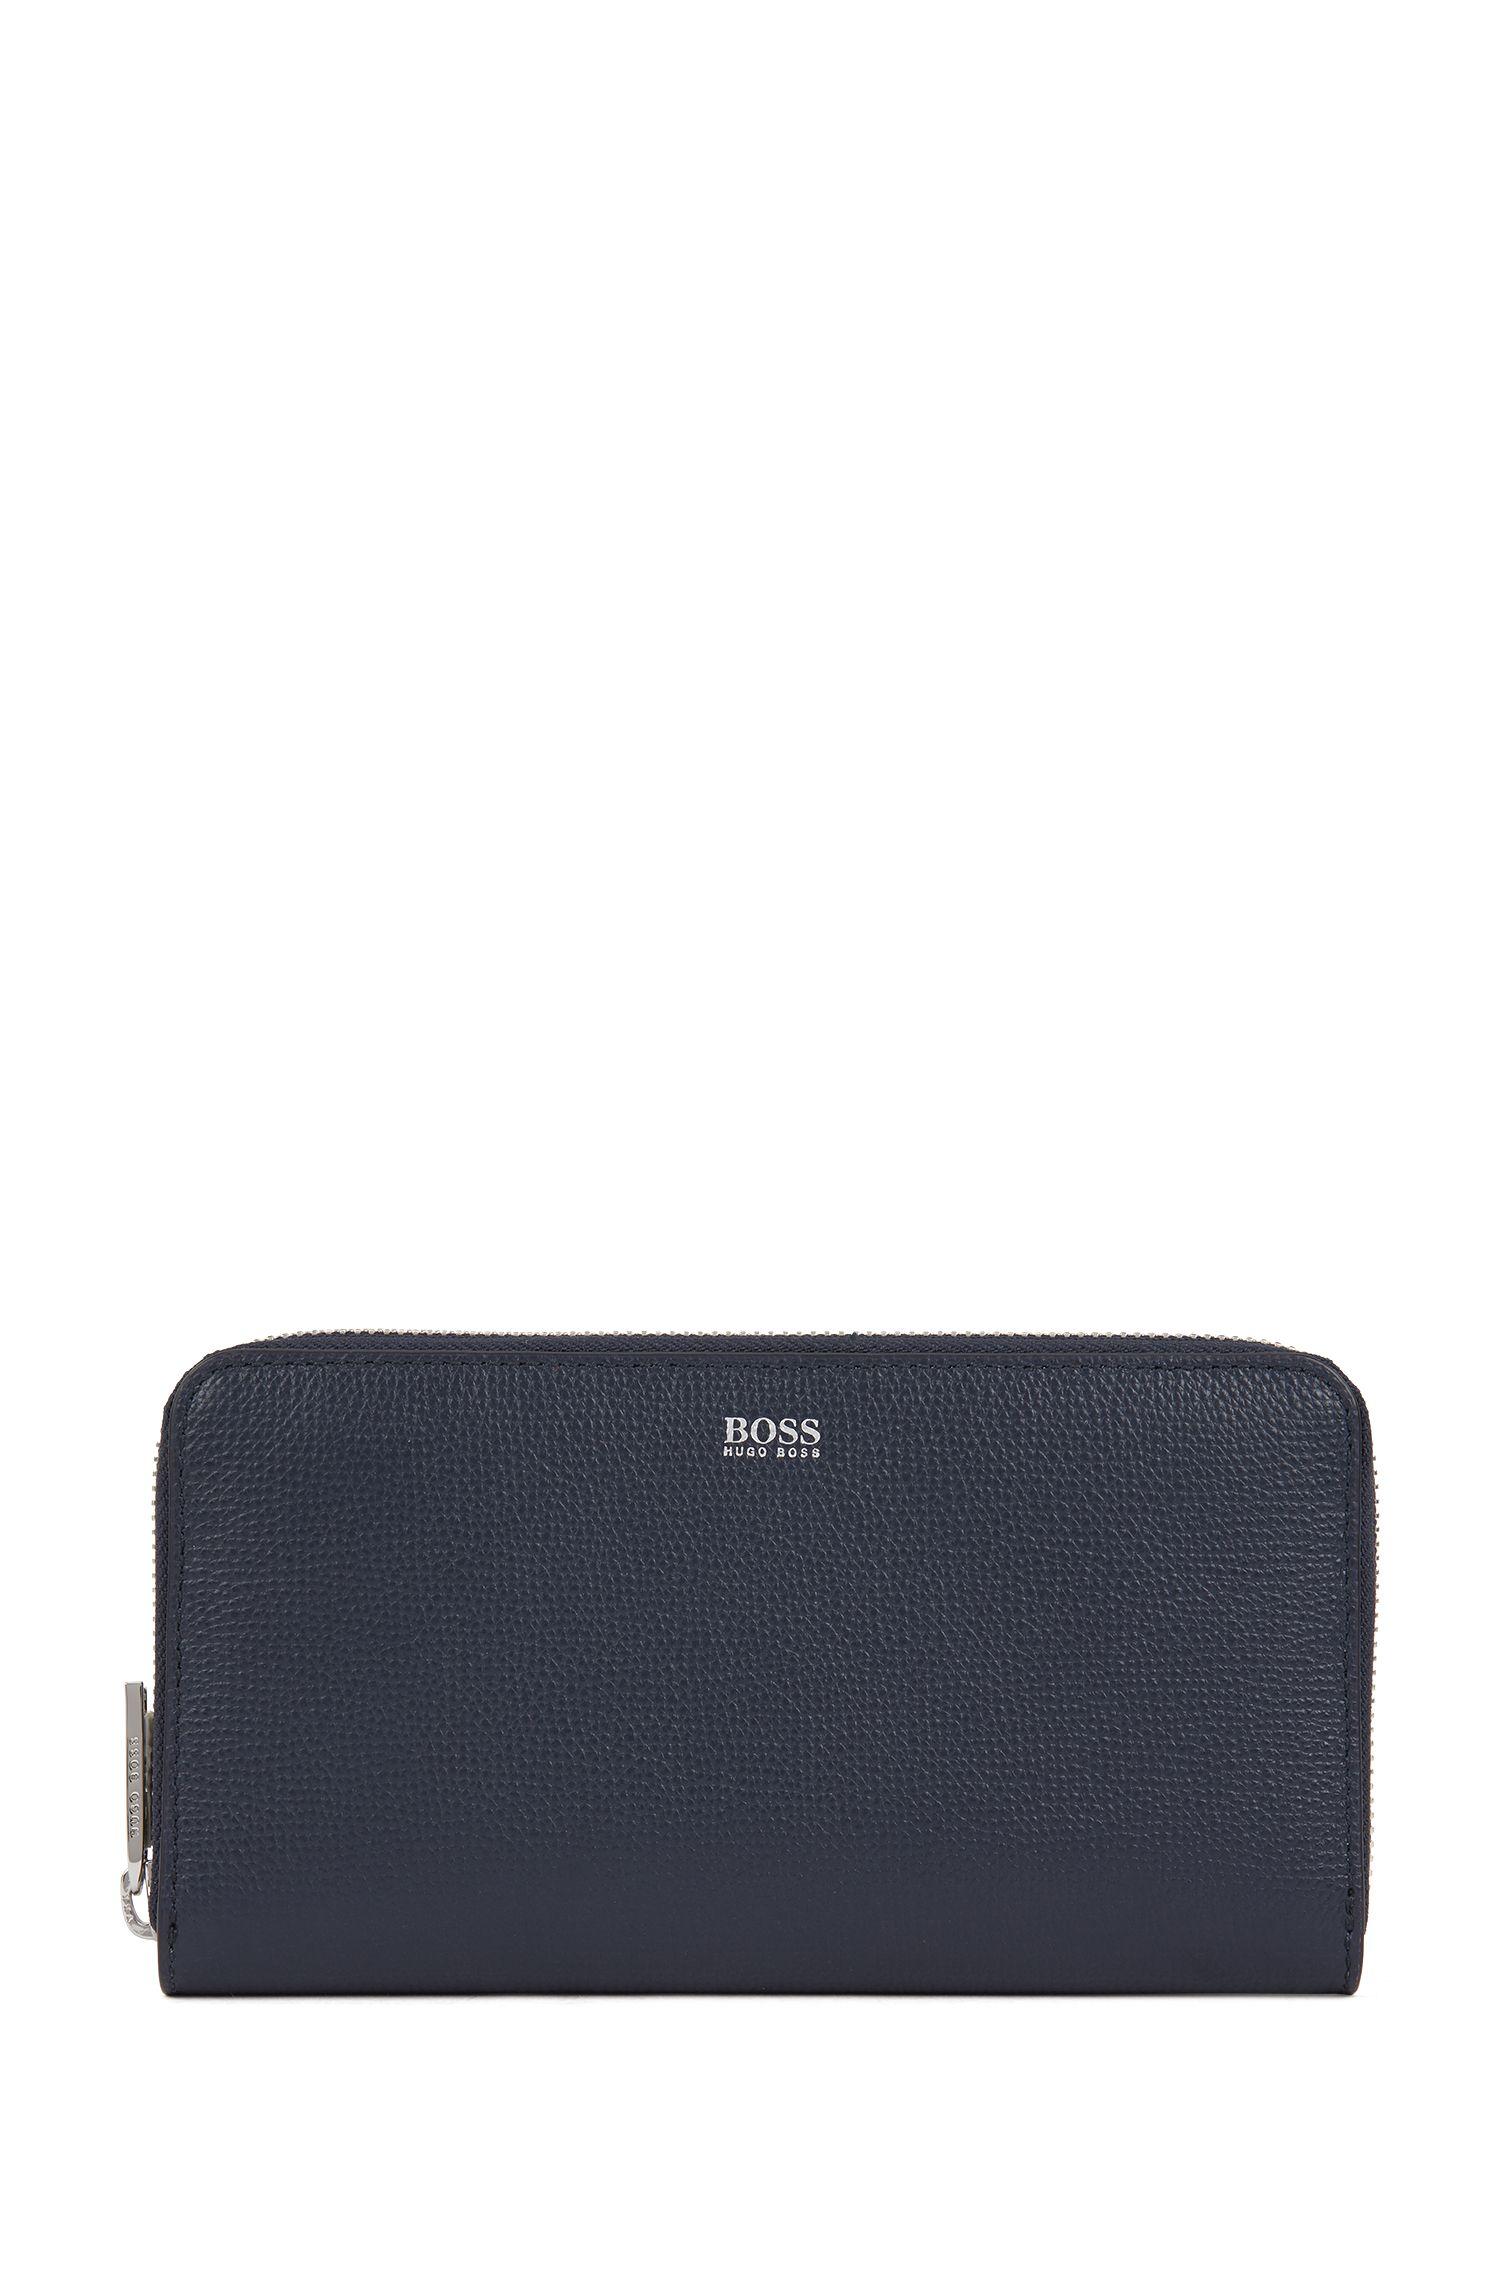 Zip-around wallet in grained Italian leather, Dark Blue